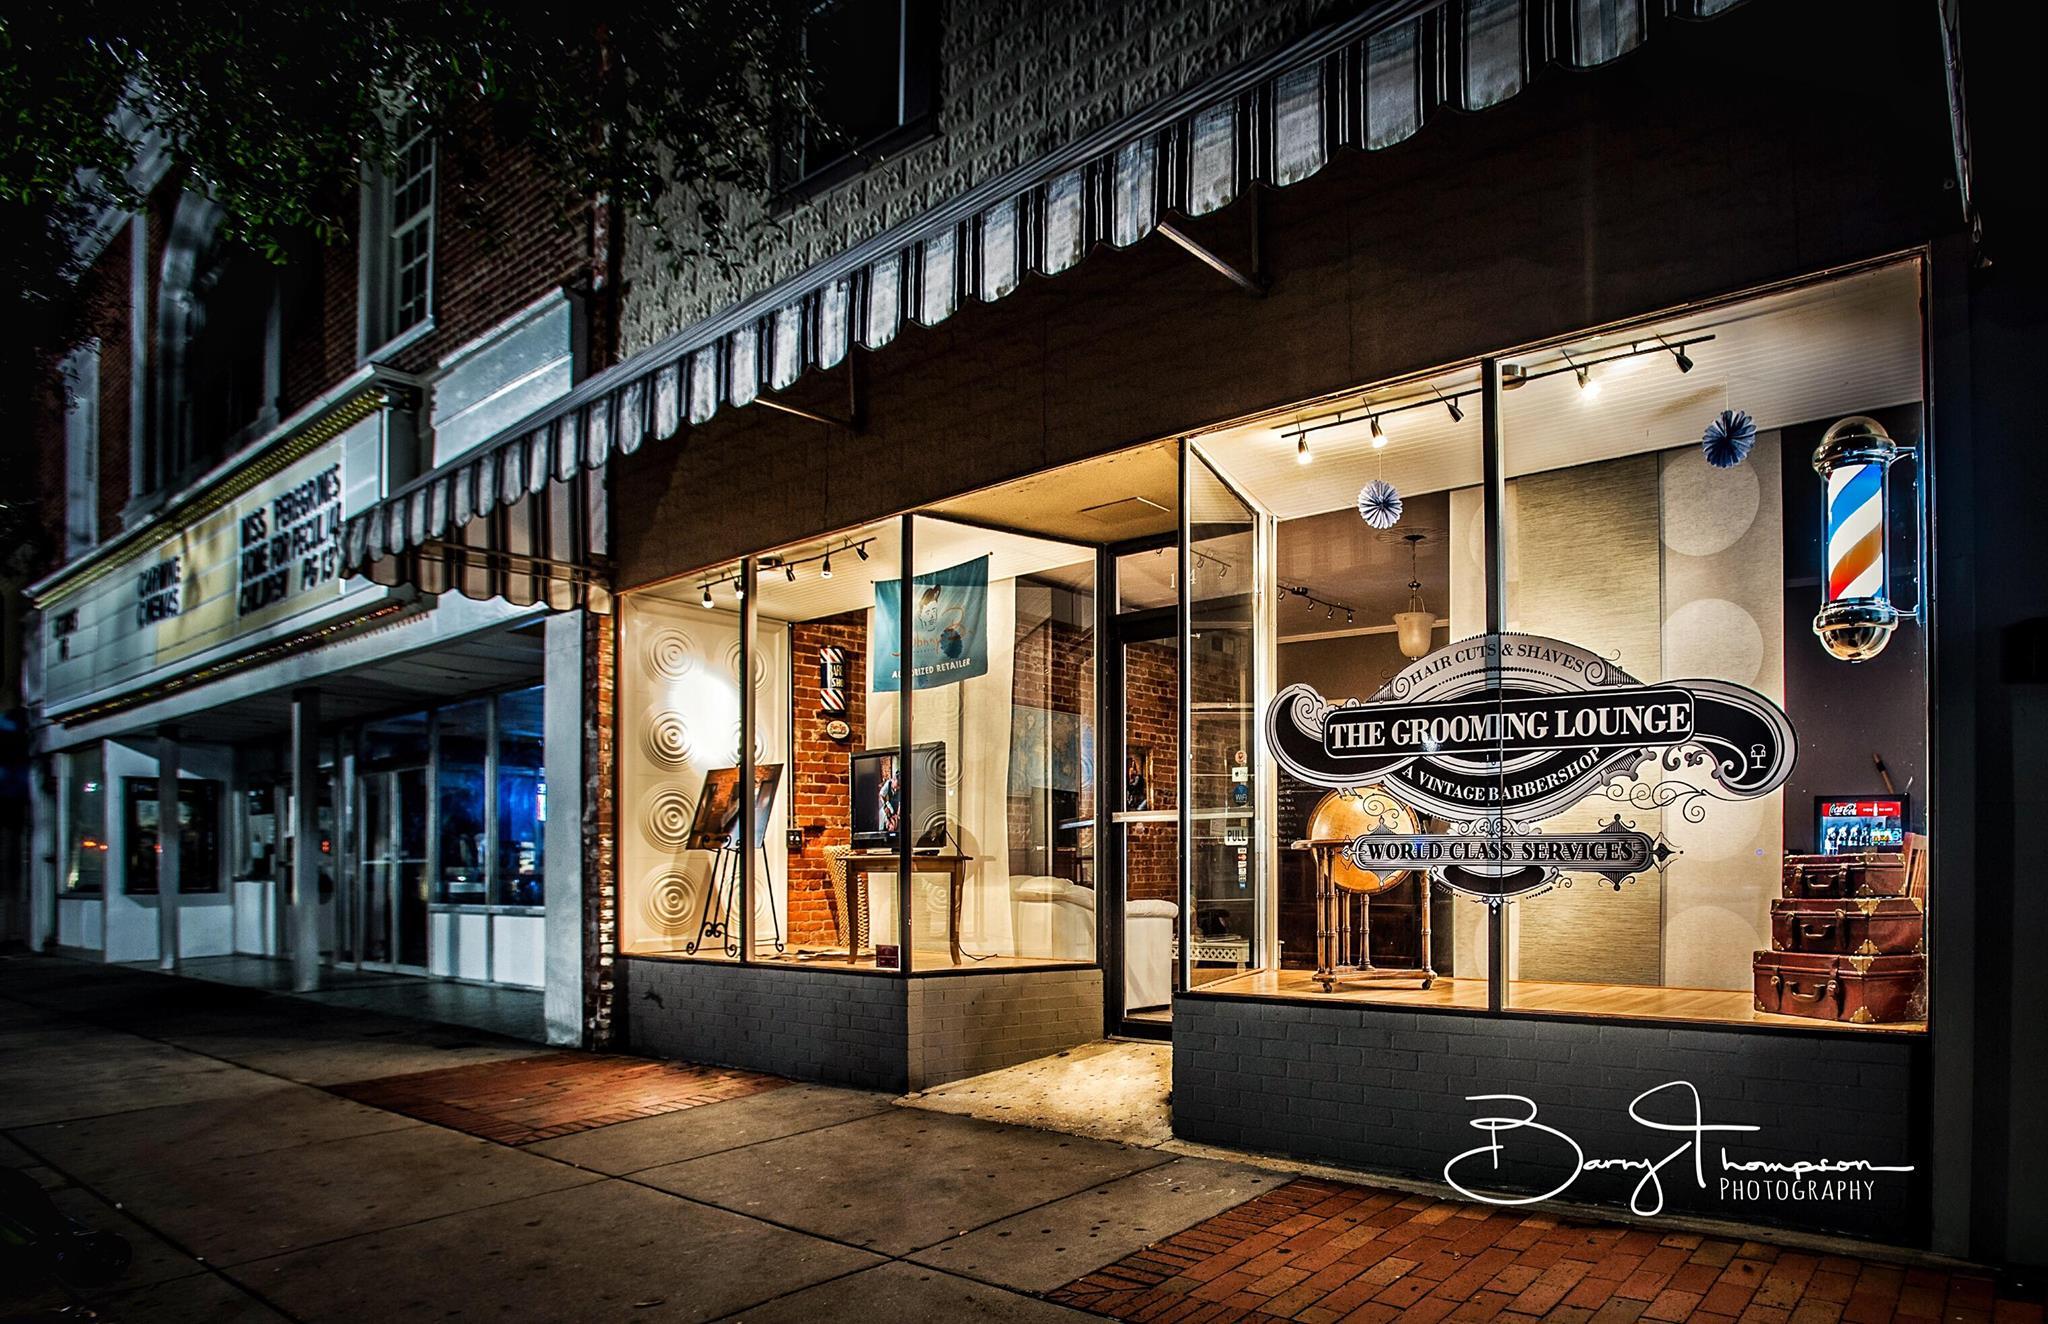 hartsville-grooming-lounge-barber-storefront